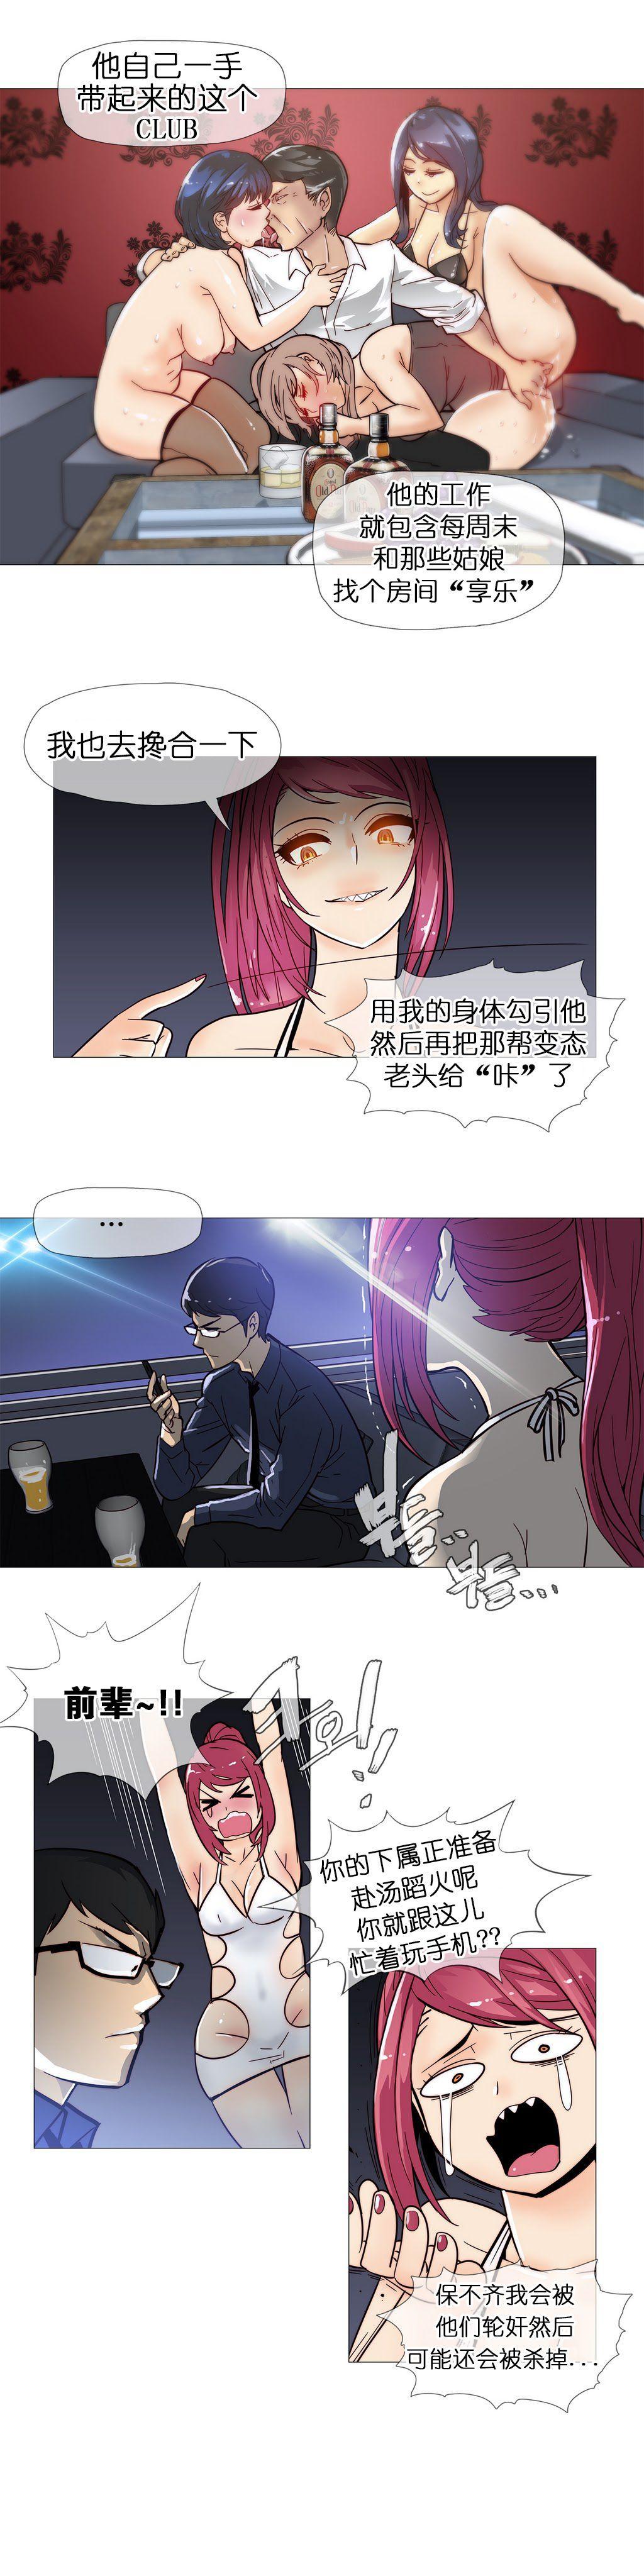 HouseHold Affairs 【卞赤鲤个人汉化】1~21话(持续更新中) 180